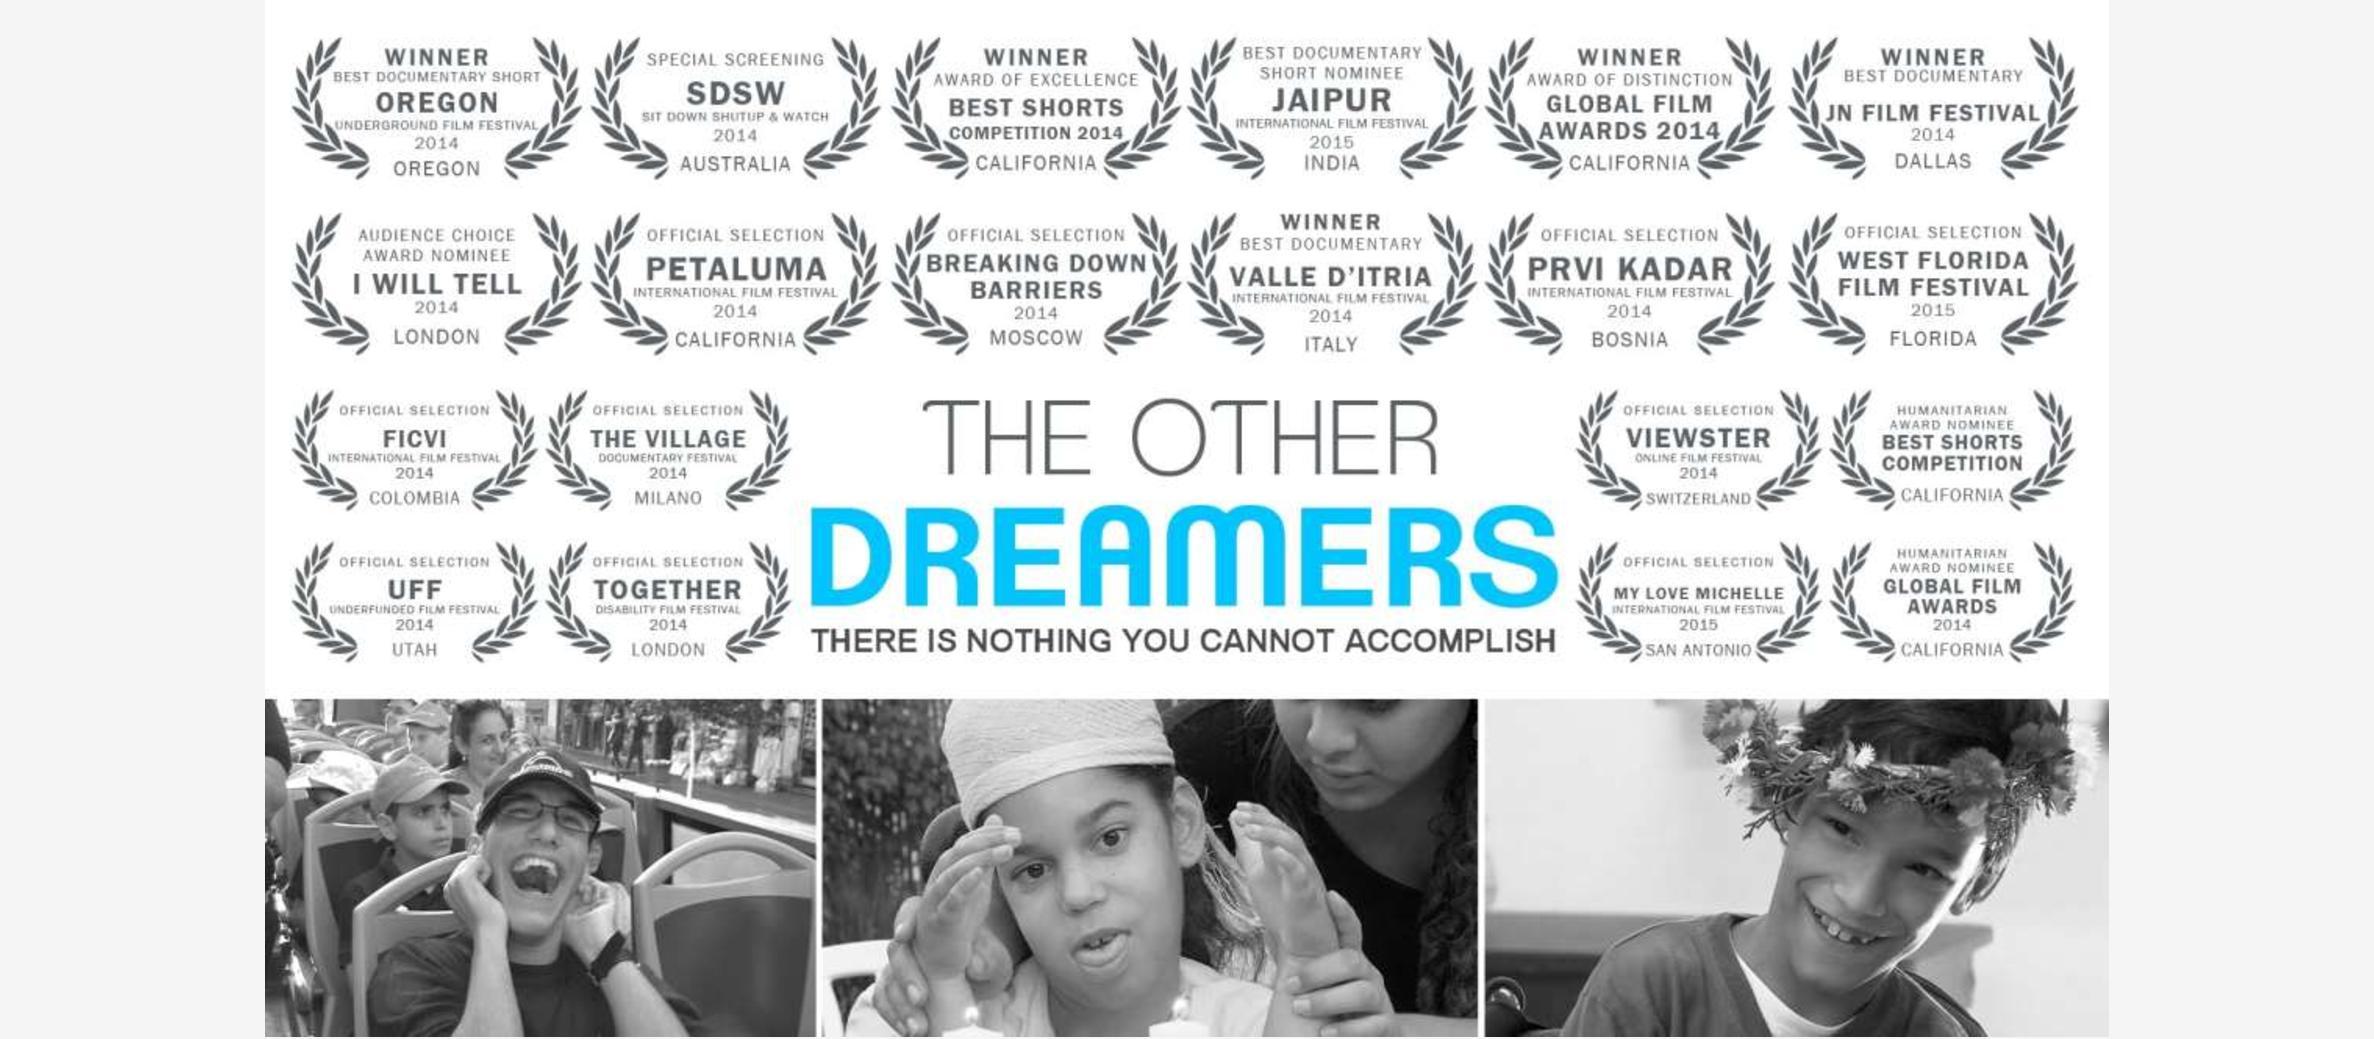 Norwegian fim festival boycotts Israeli film on children with disabilities